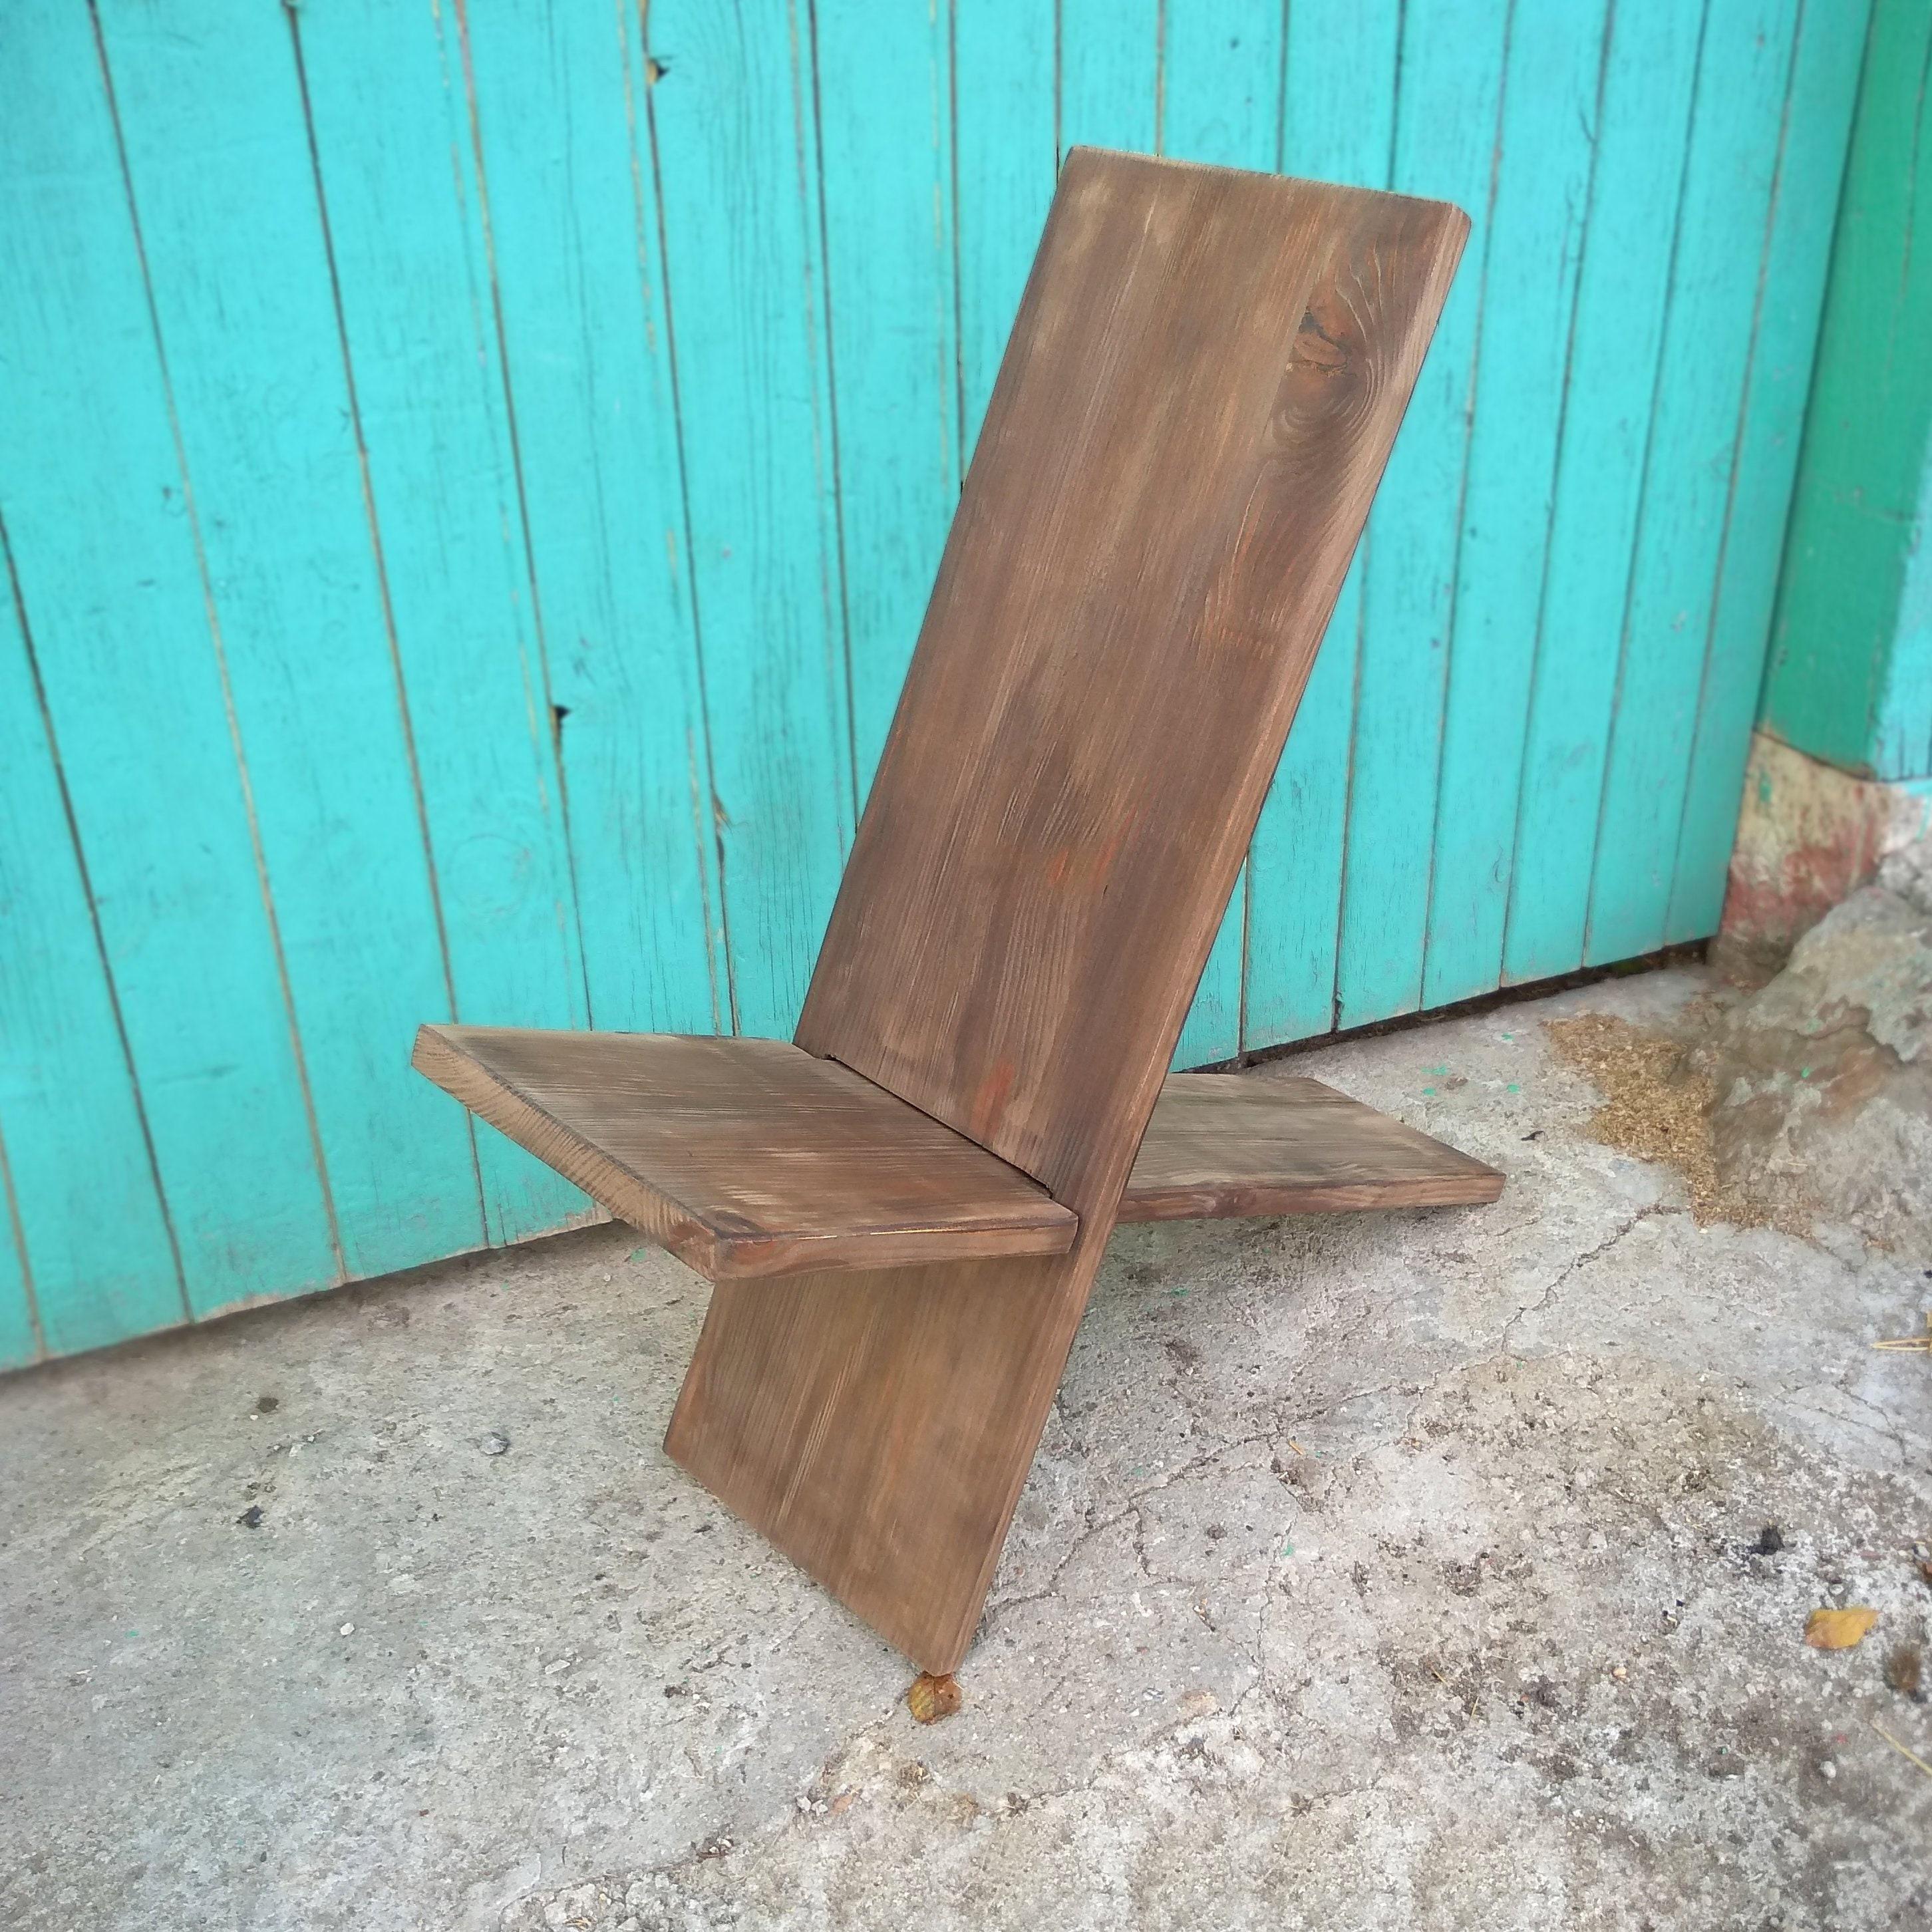 Awe Inspiring Viking Chair Stargazer Chair Foldable Wooden Chair Two Piece Garden Furniture Holzstuhl Camp Chair Rustic Yard Chair Download Free Architecture Designs Rallybritishbridgeorg